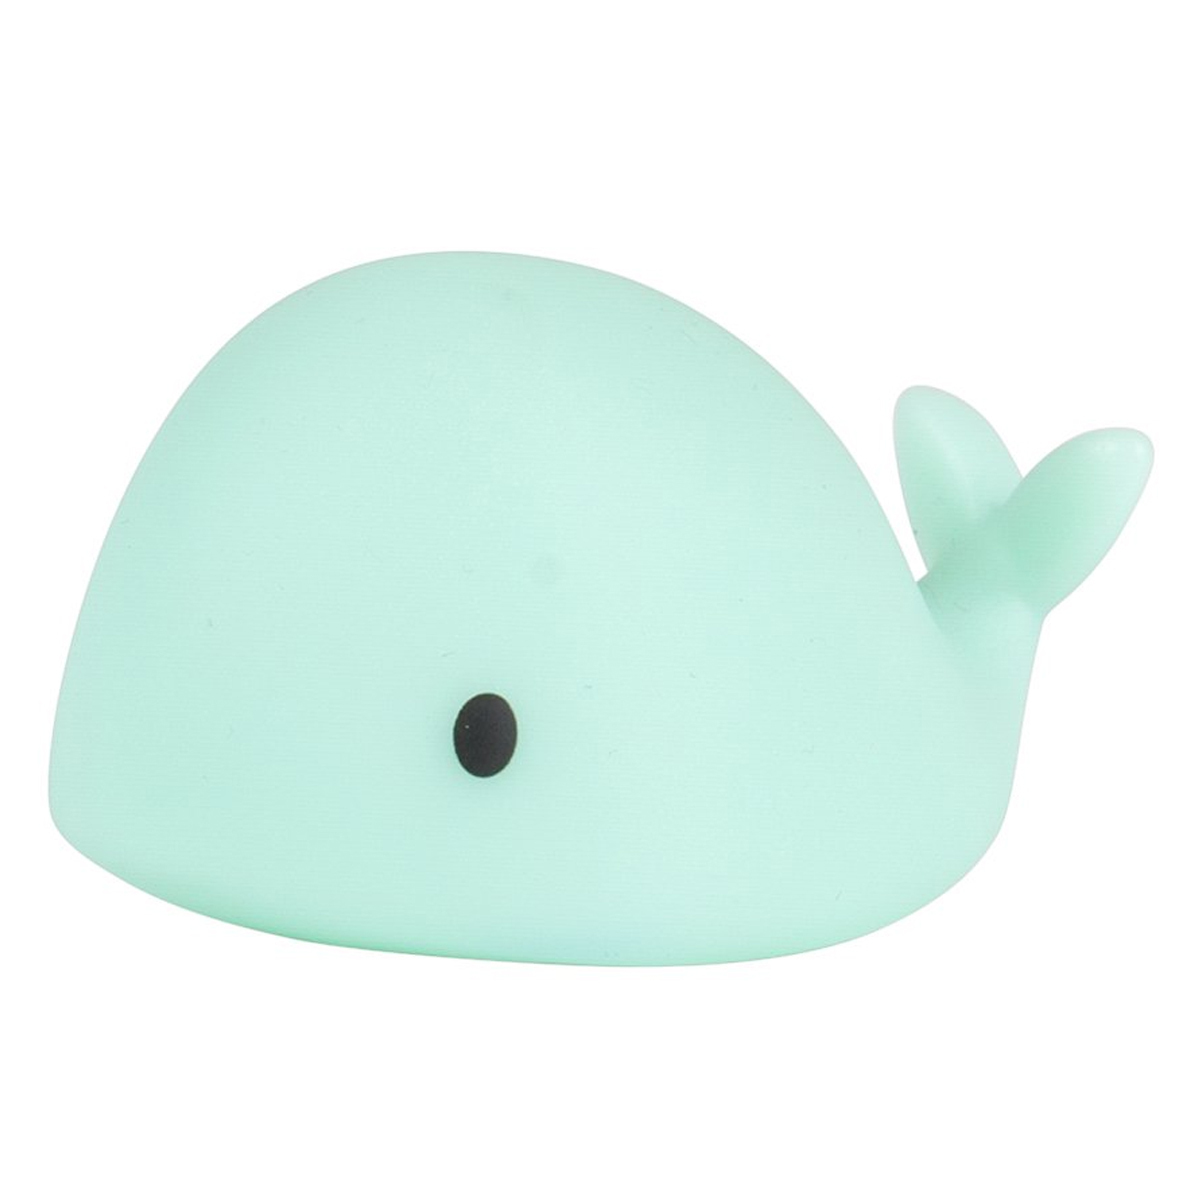 Veilleuse Mini Veilleuse Baleine Moby Vert Mini Veilleuse Baleine Moby Vert